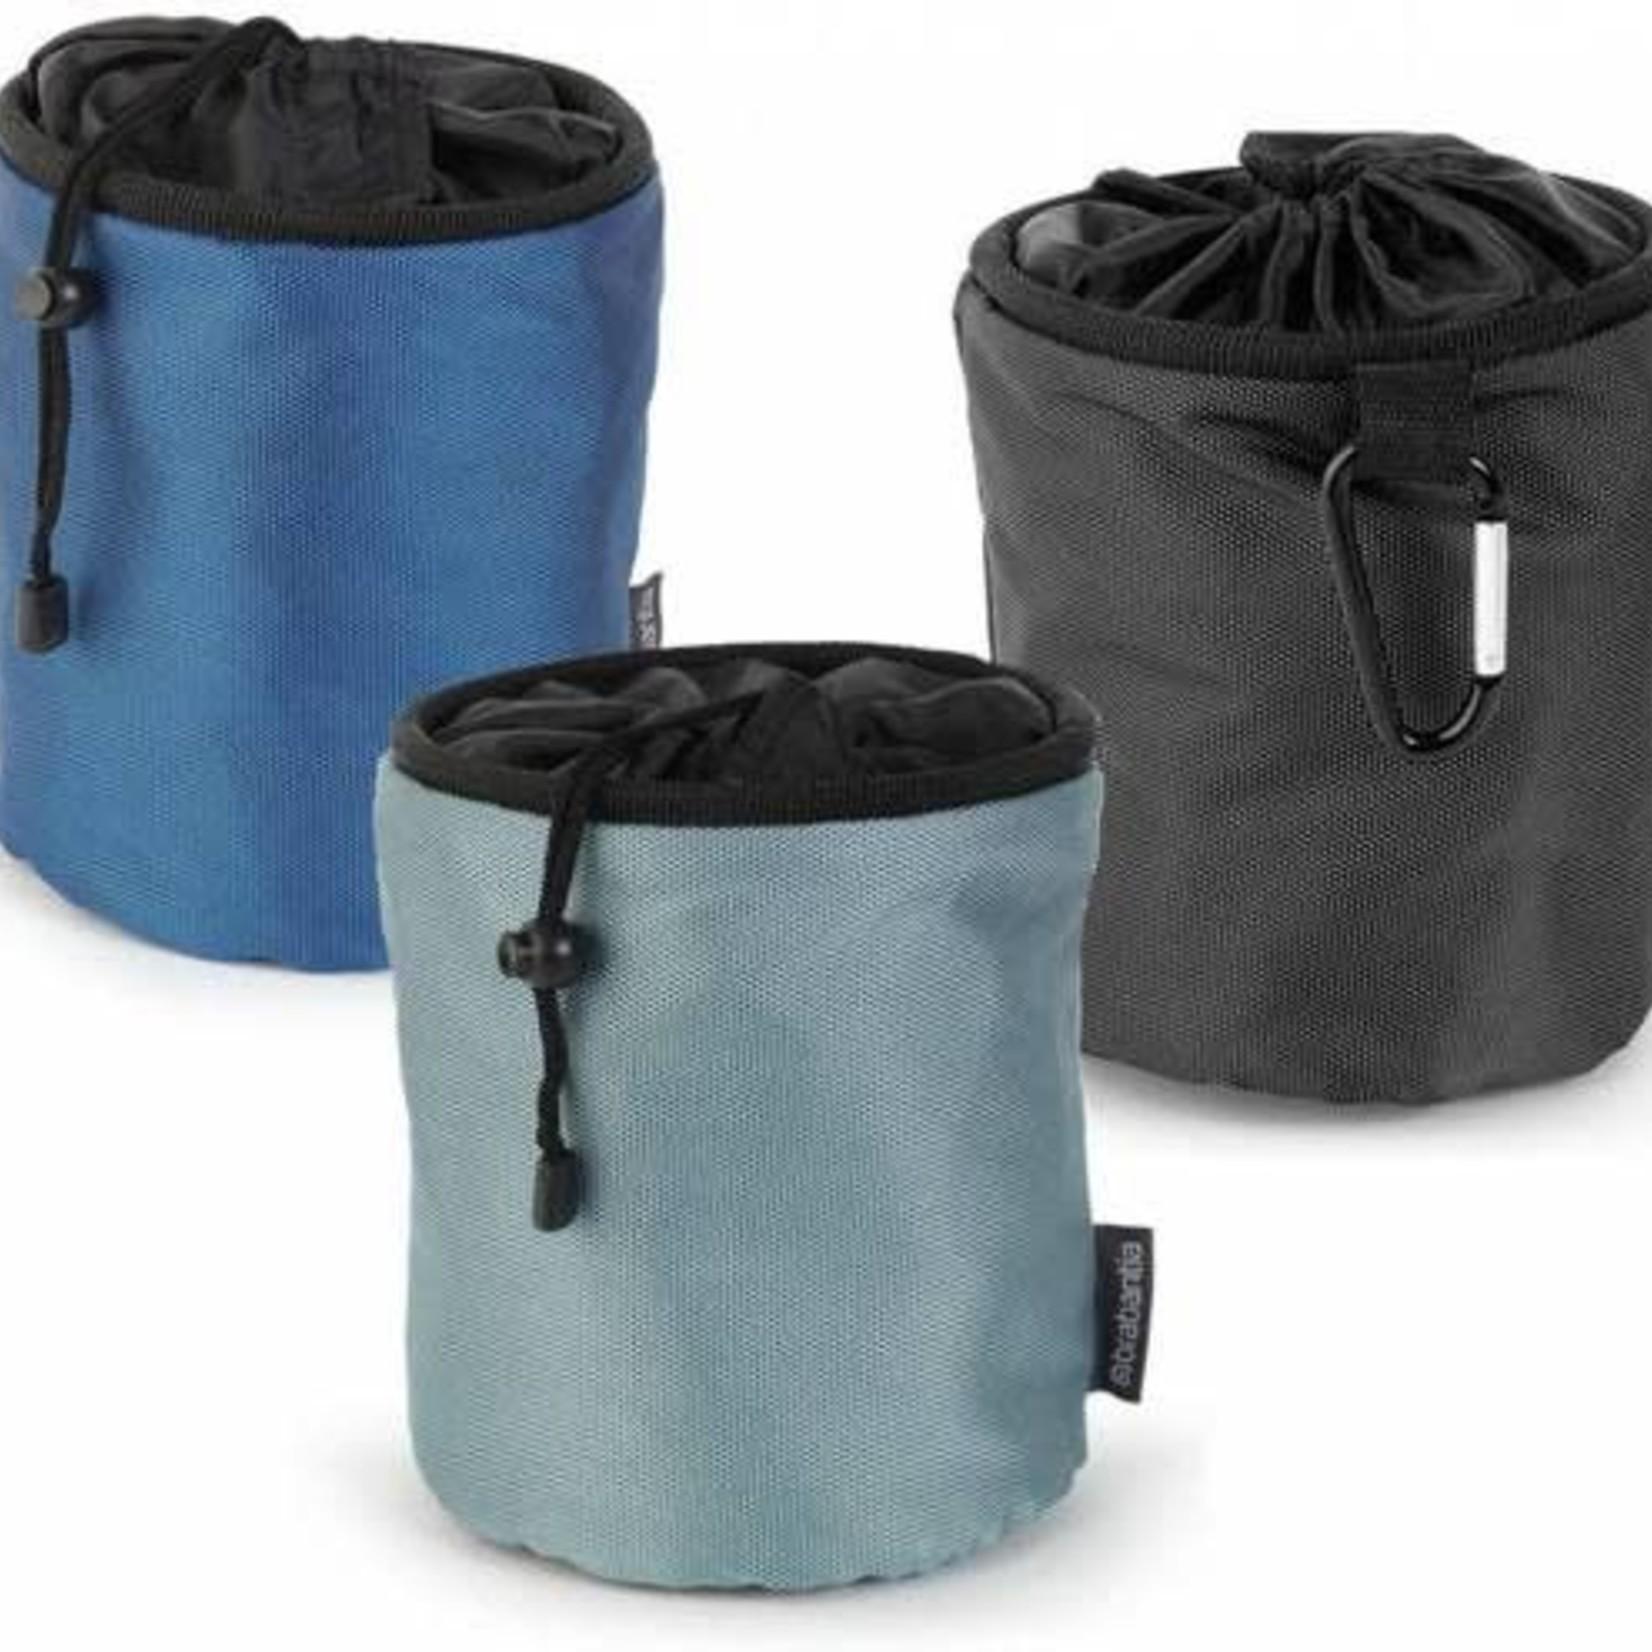 Brabantia Brabantia Clothes Peg Bag Assorted